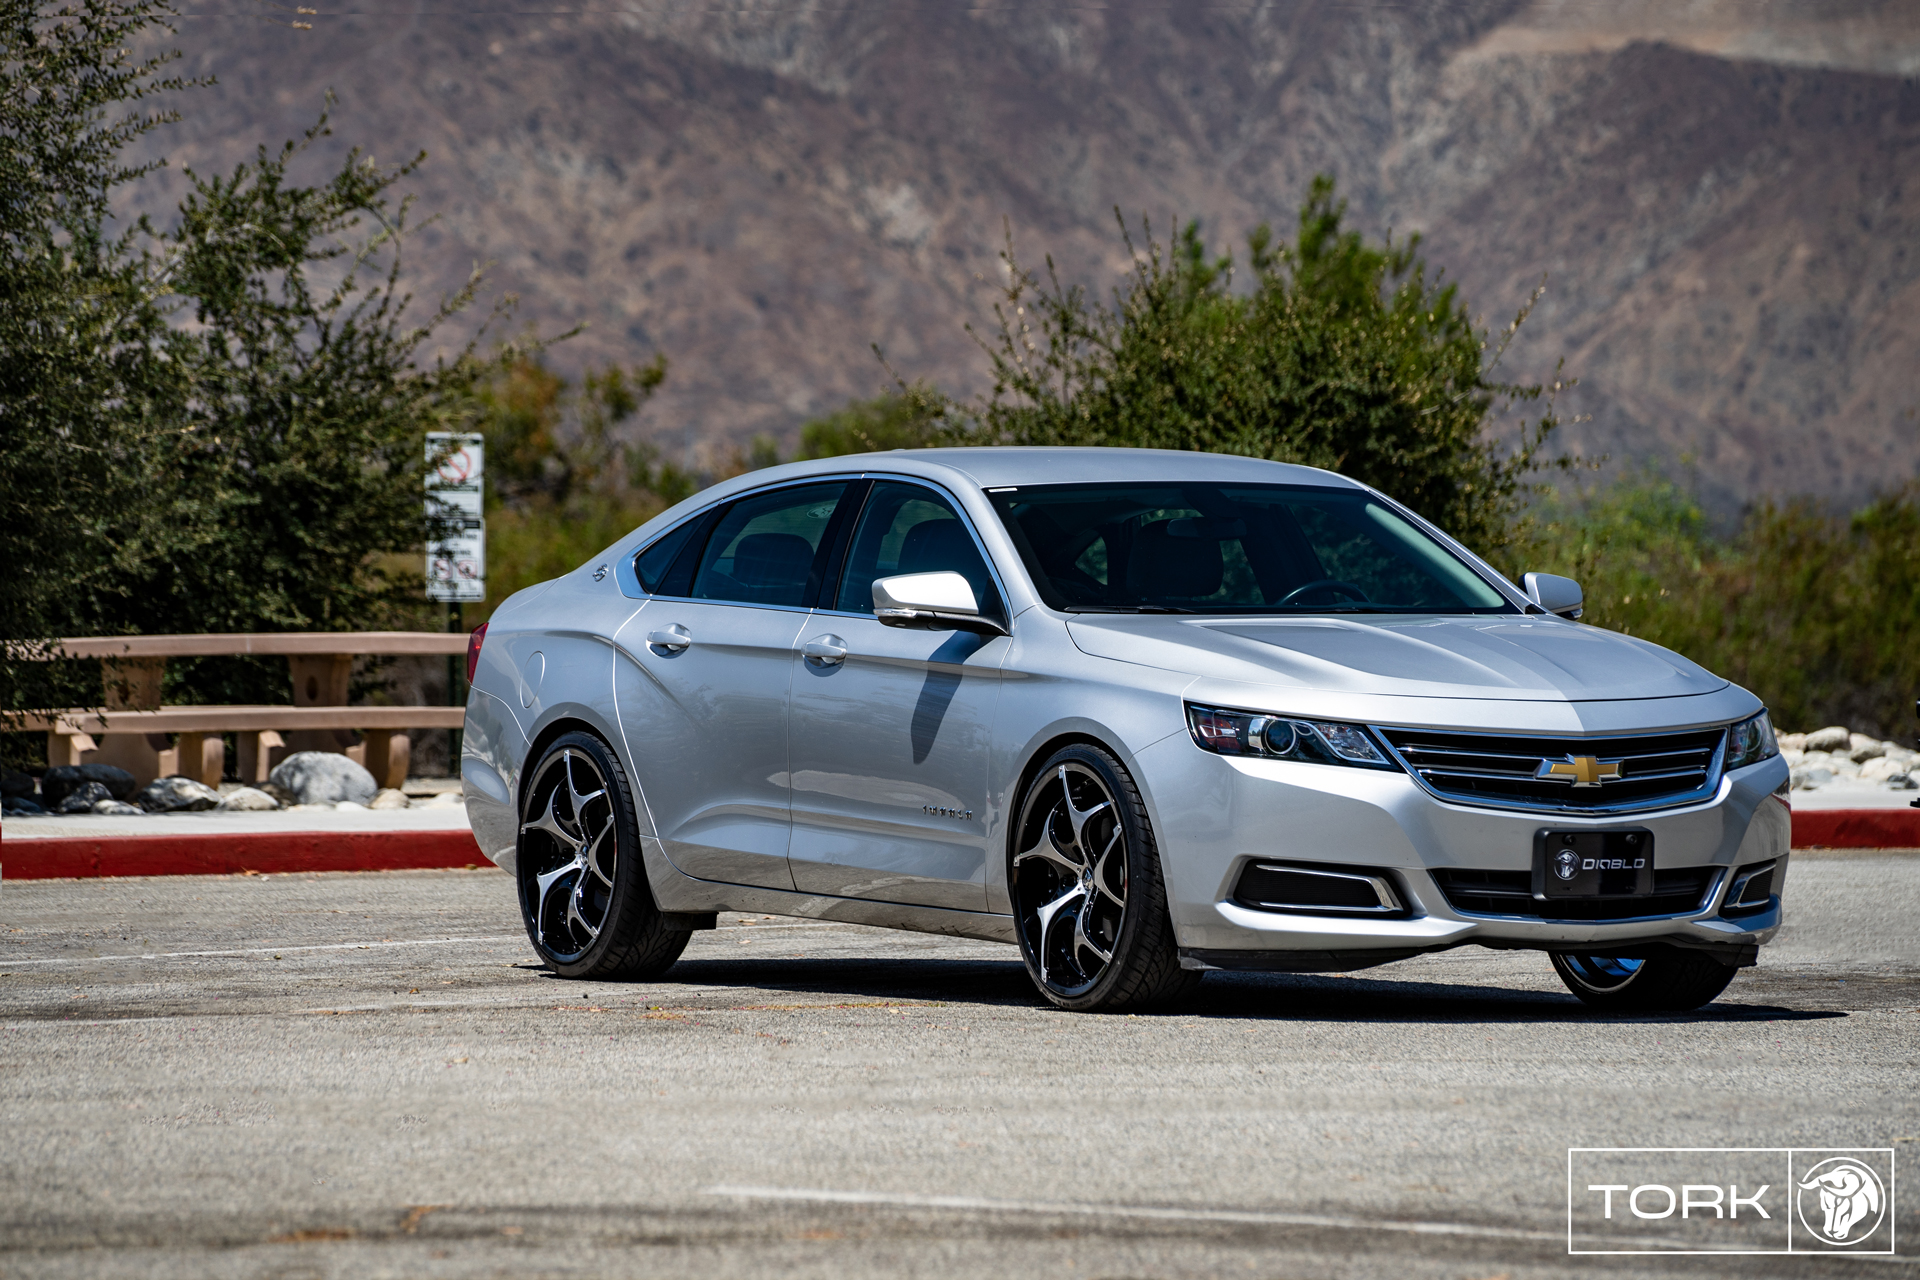 Tork Chevrolet Impala Diablo Wheels